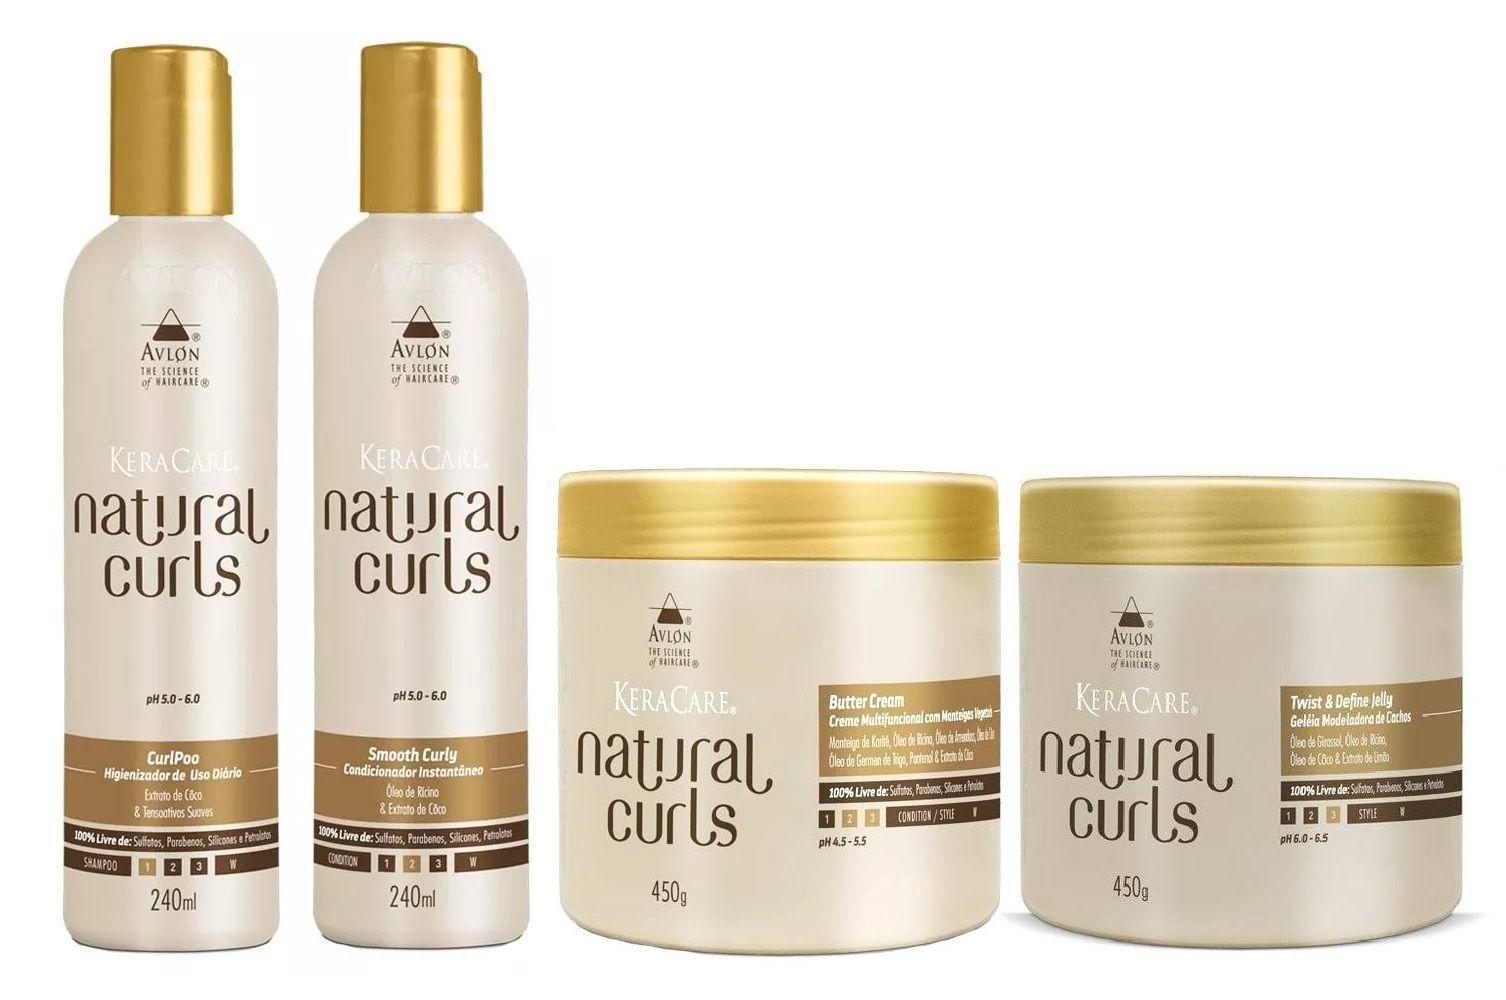 Kit Avlon Natural Curls Cabelos Cacheados